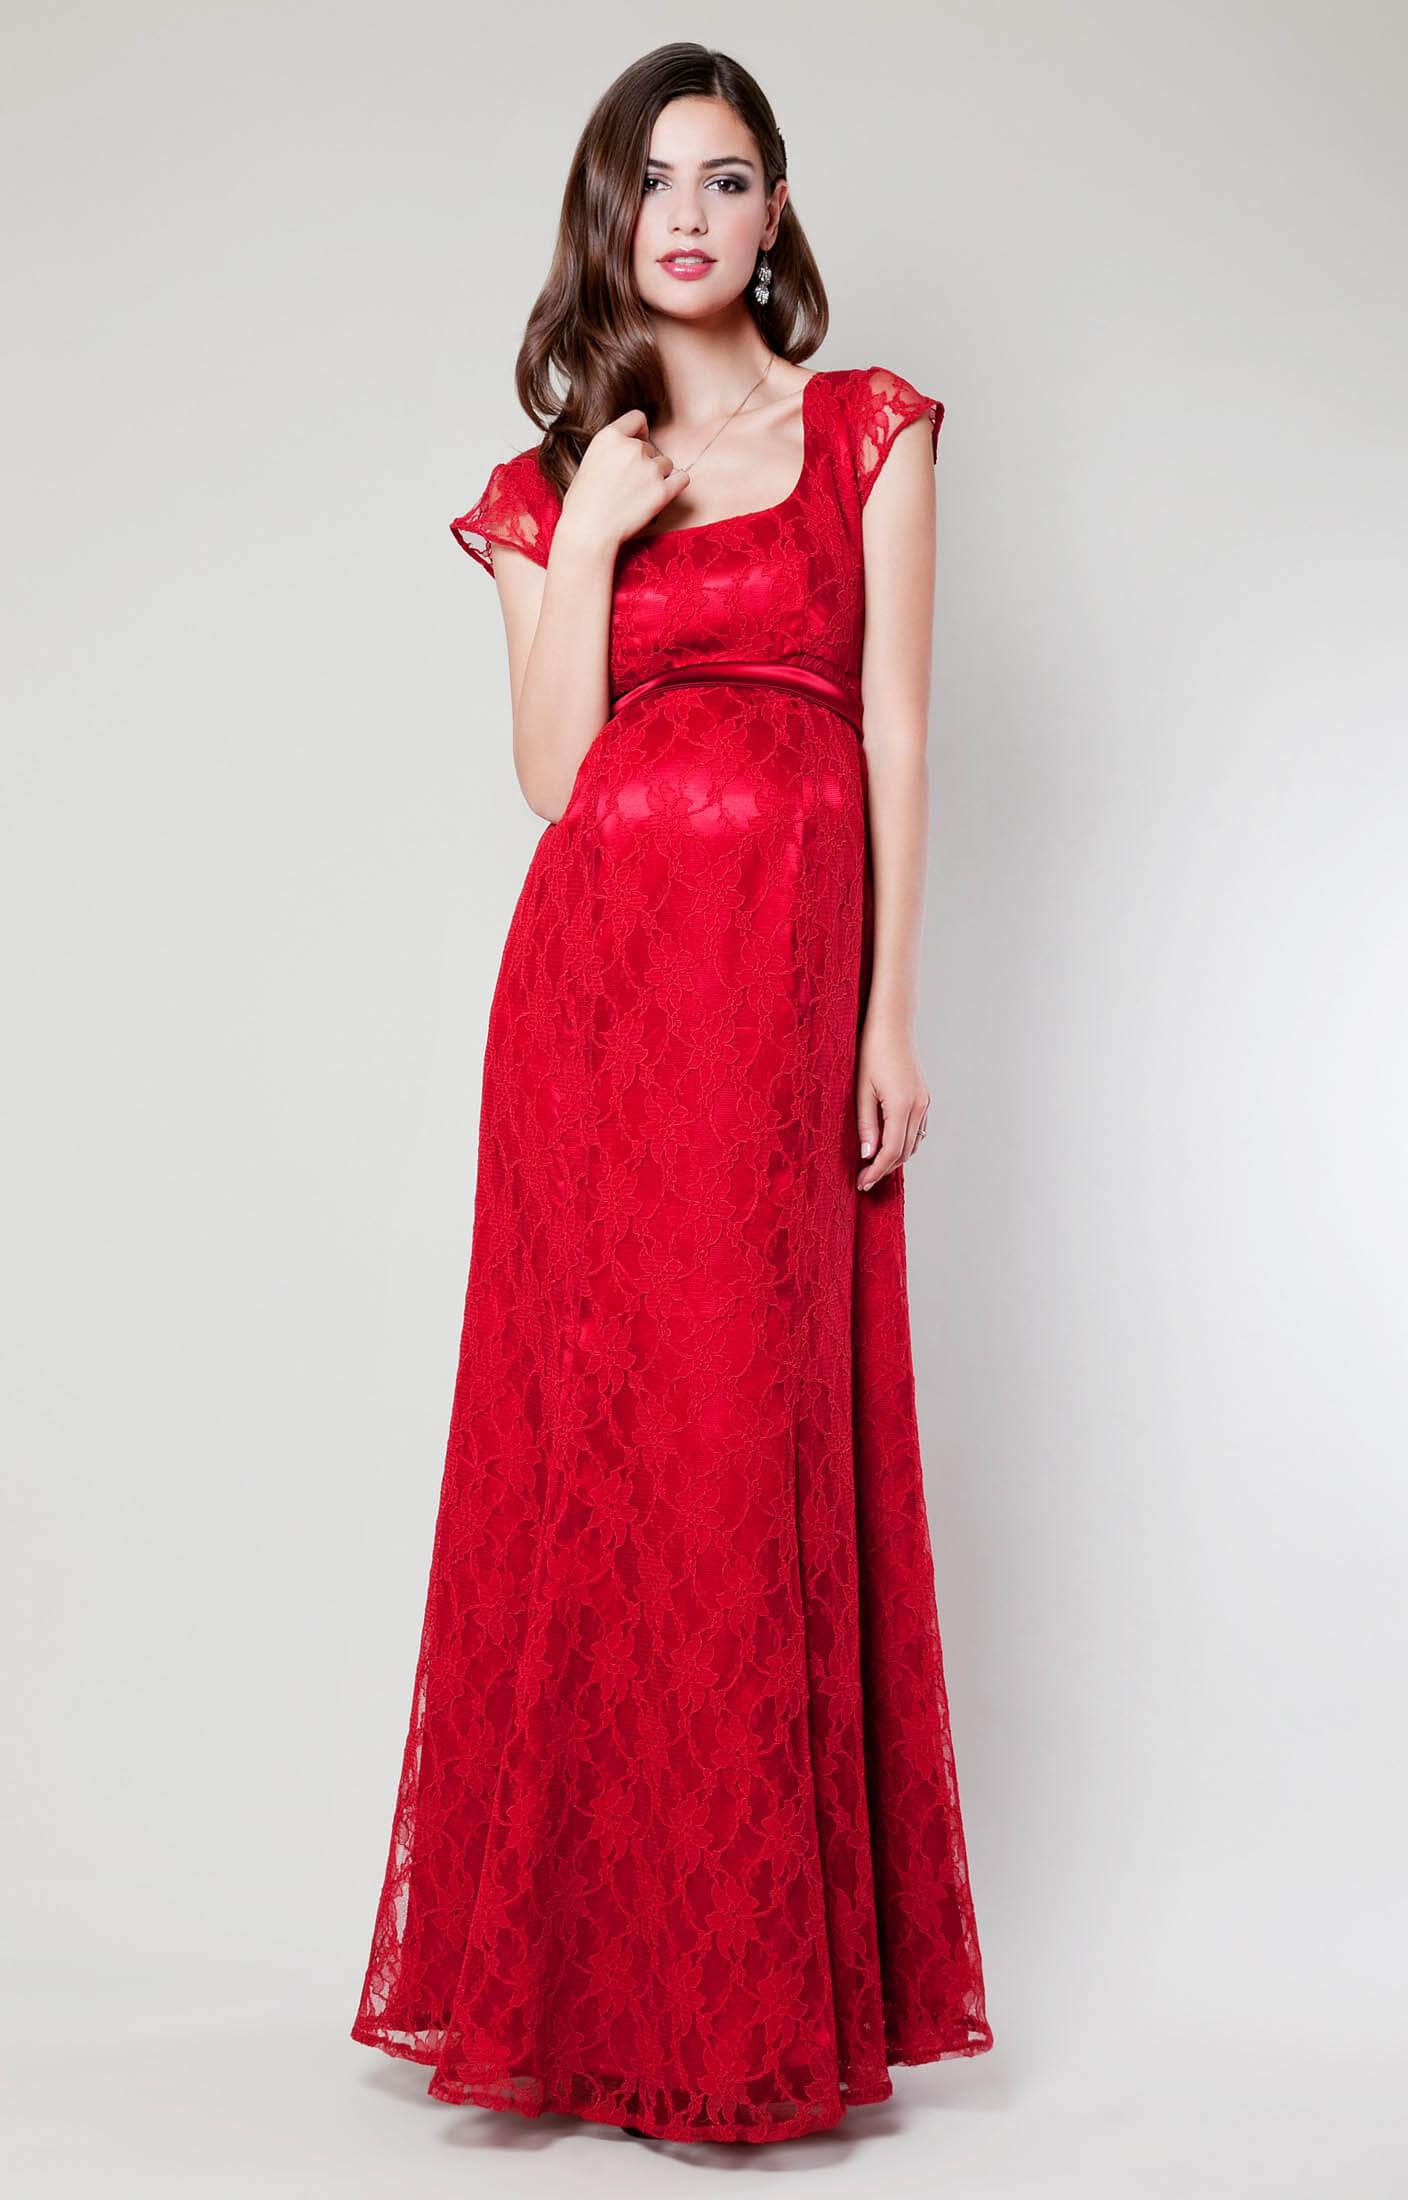 Mother of the Groom Option #1--(Eva/Aaron) | Wedding Party Attire ...